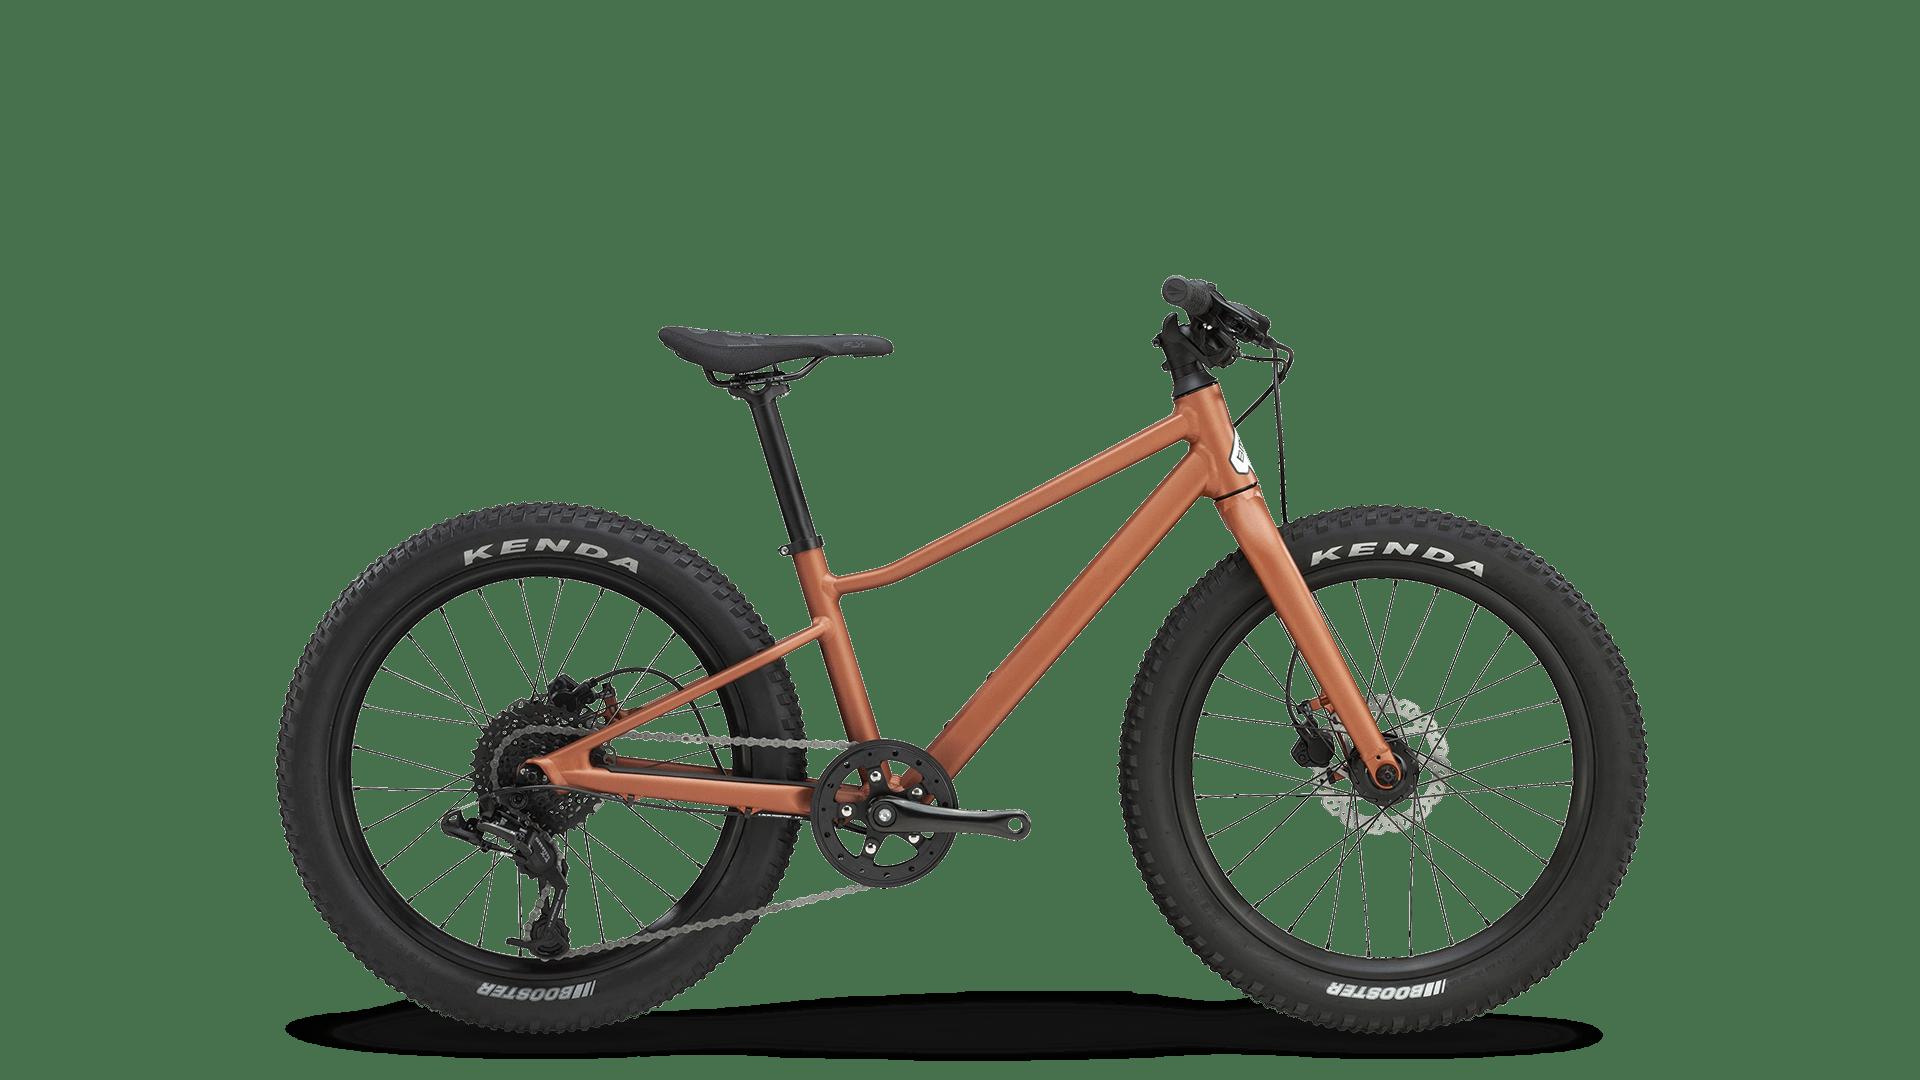 KIDDY_bike_Worldimension.jpg